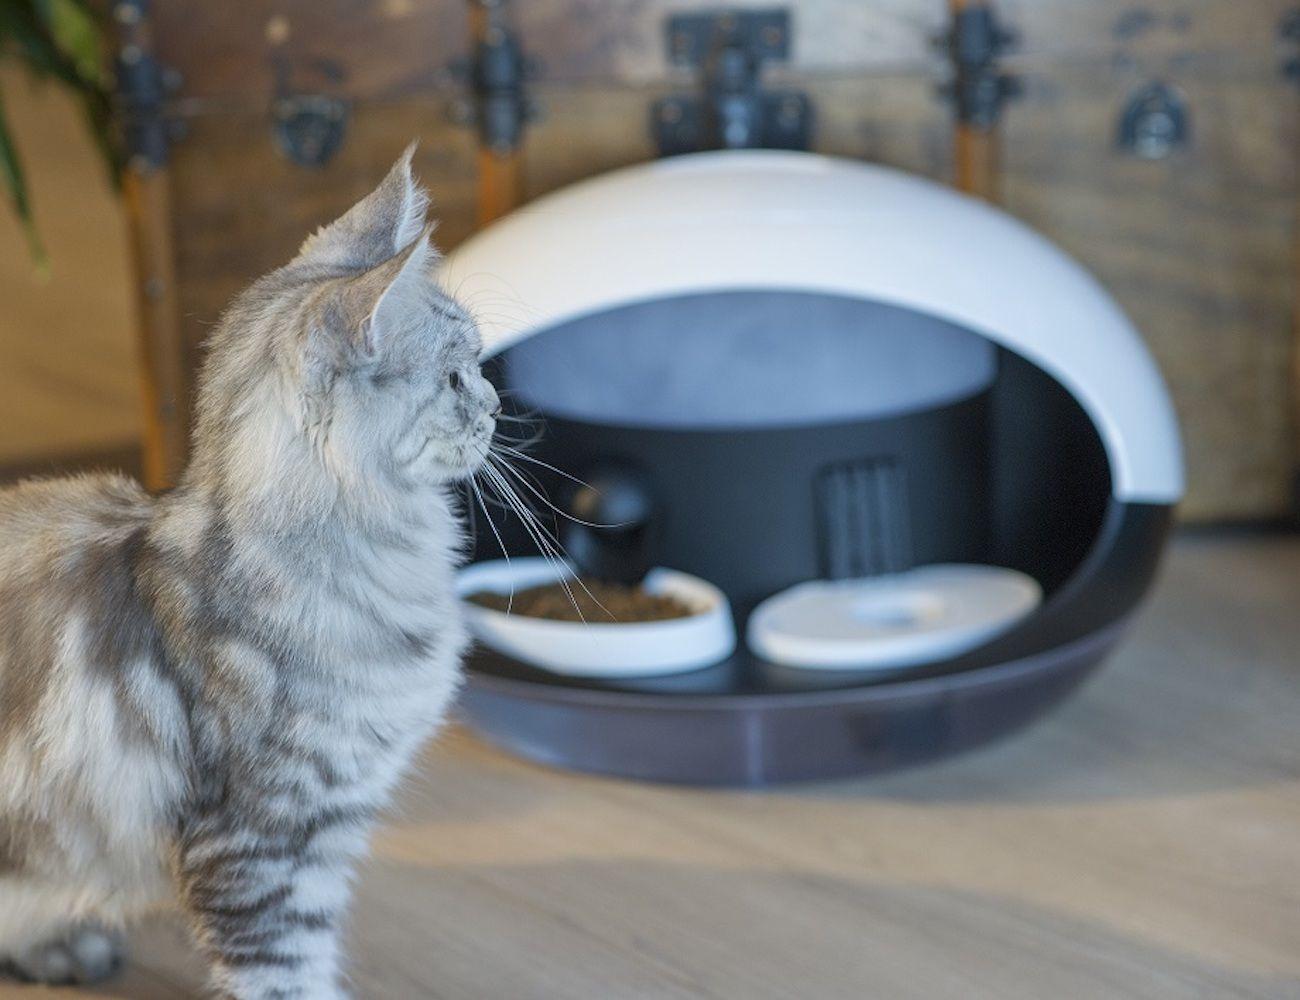 Catspad Automatic Cat Feeder